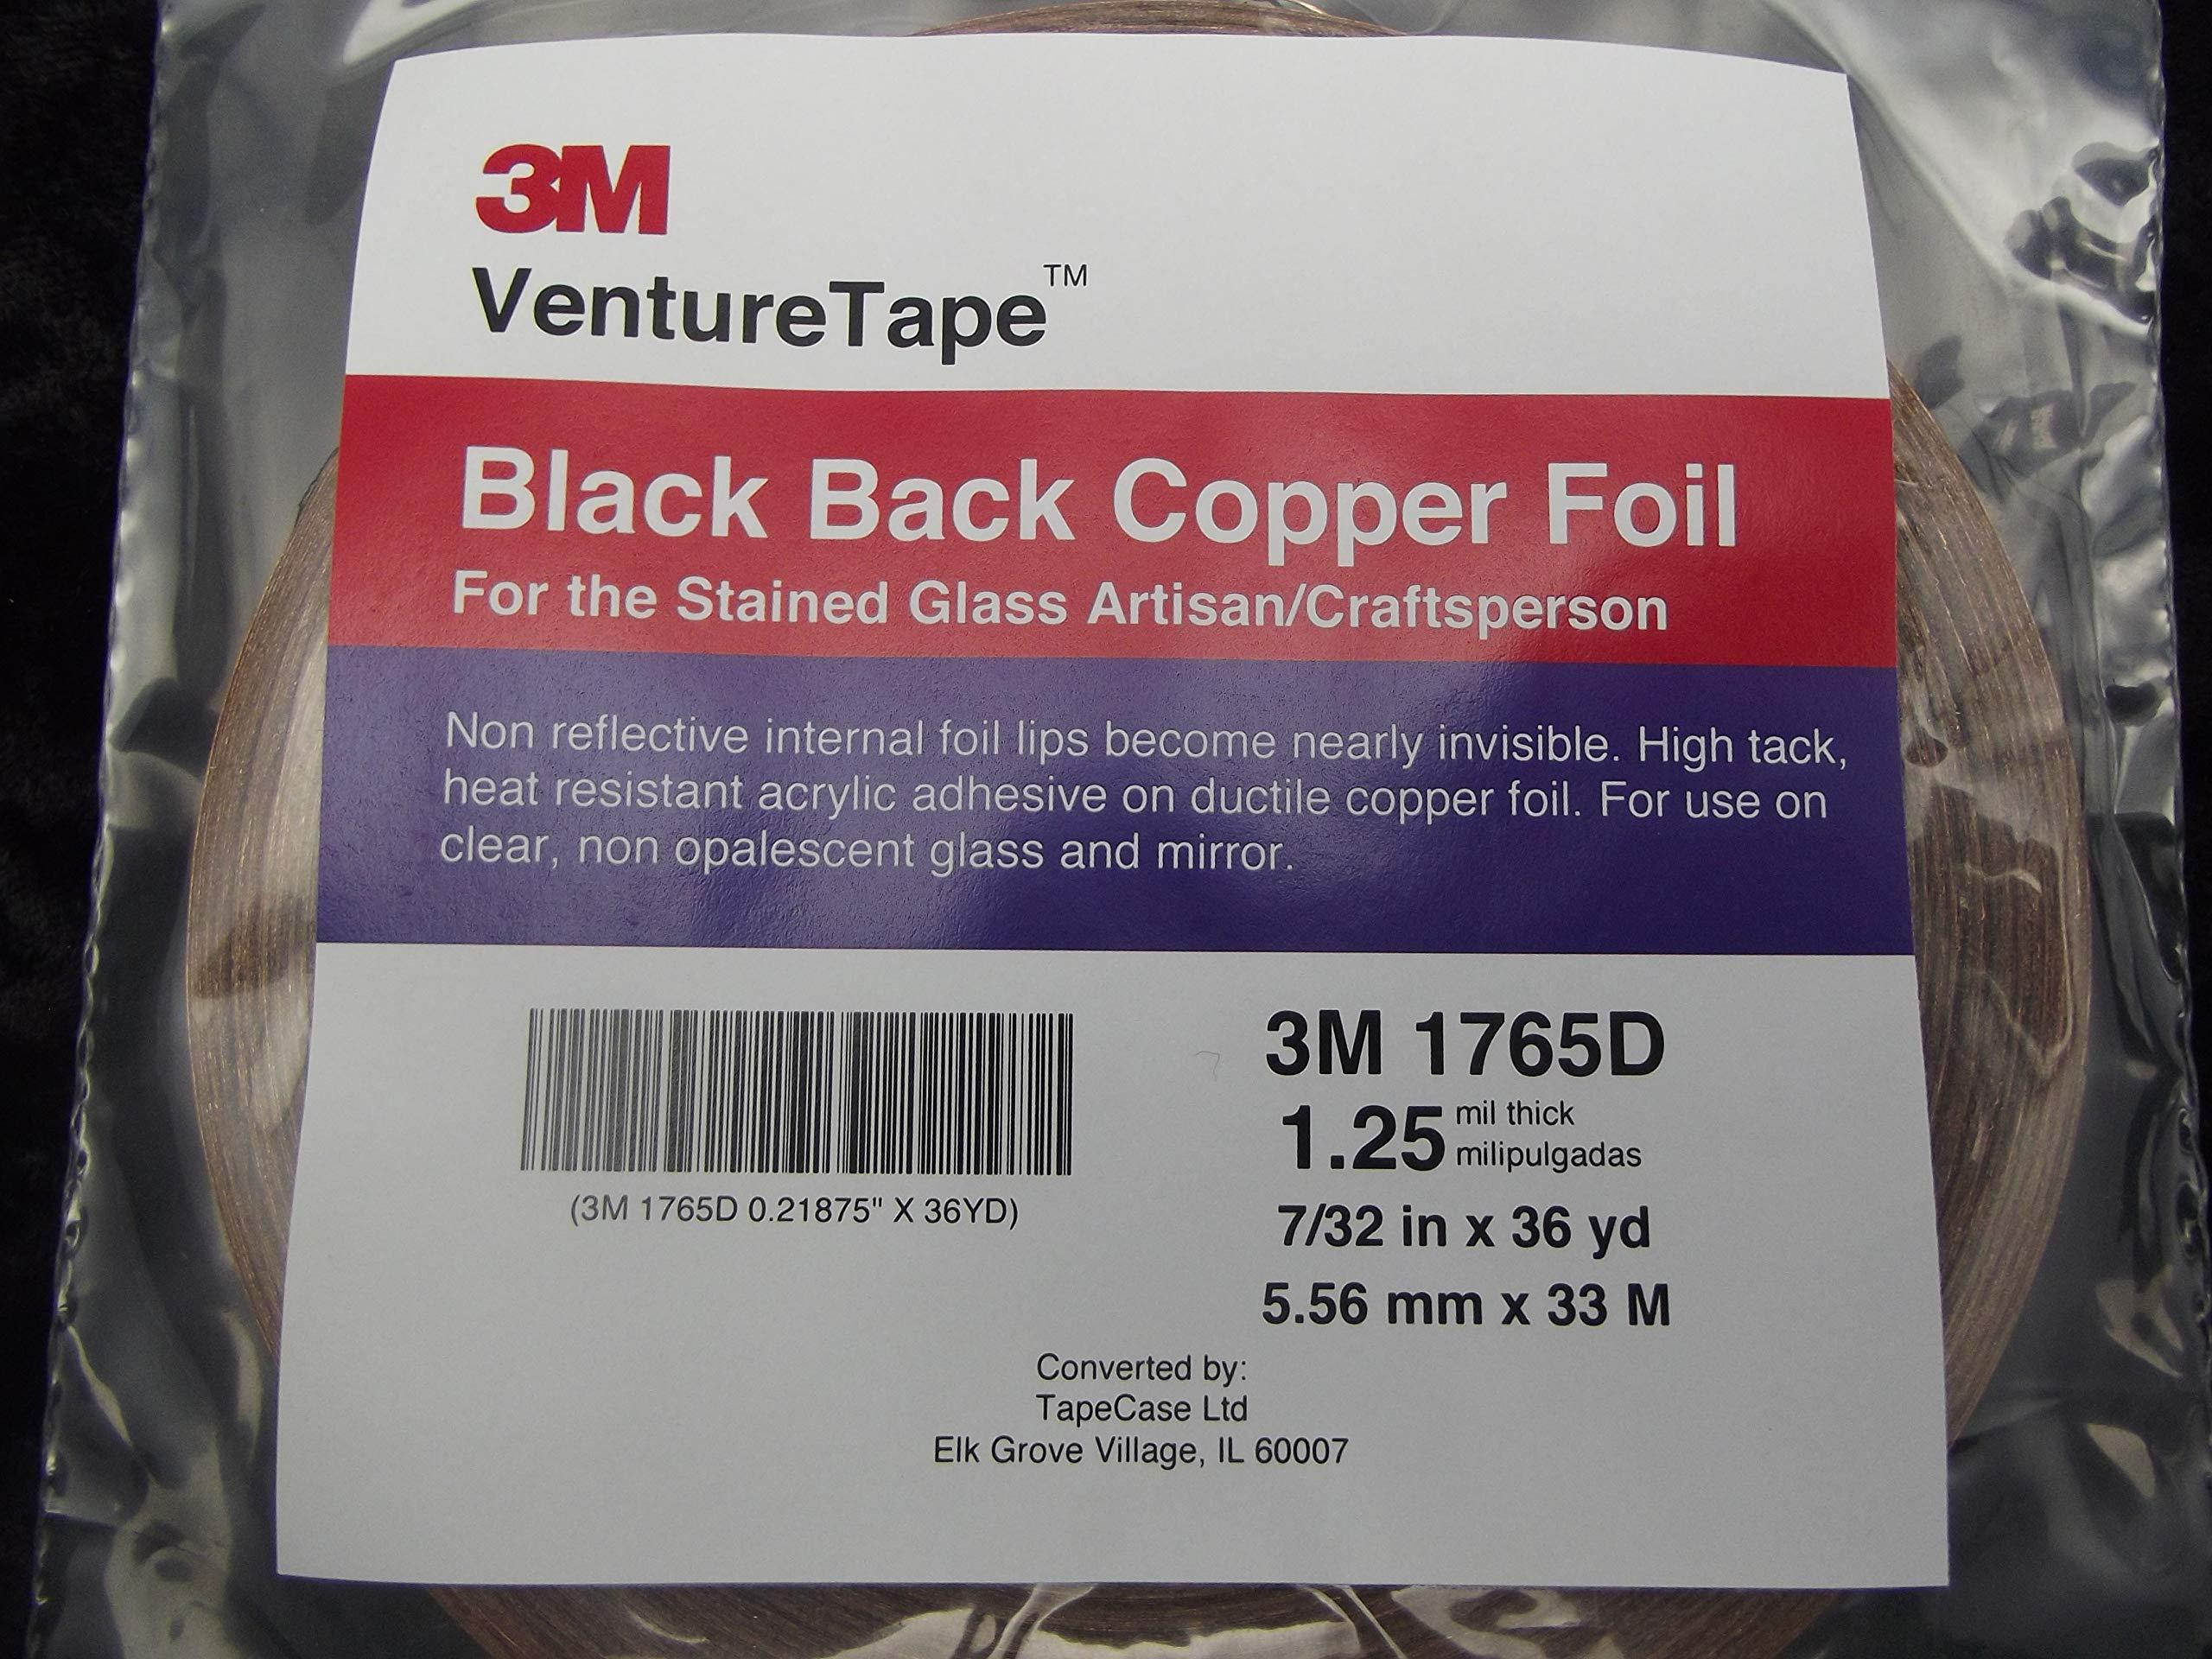 7/32 inch Venture Black Backed Copper Foil